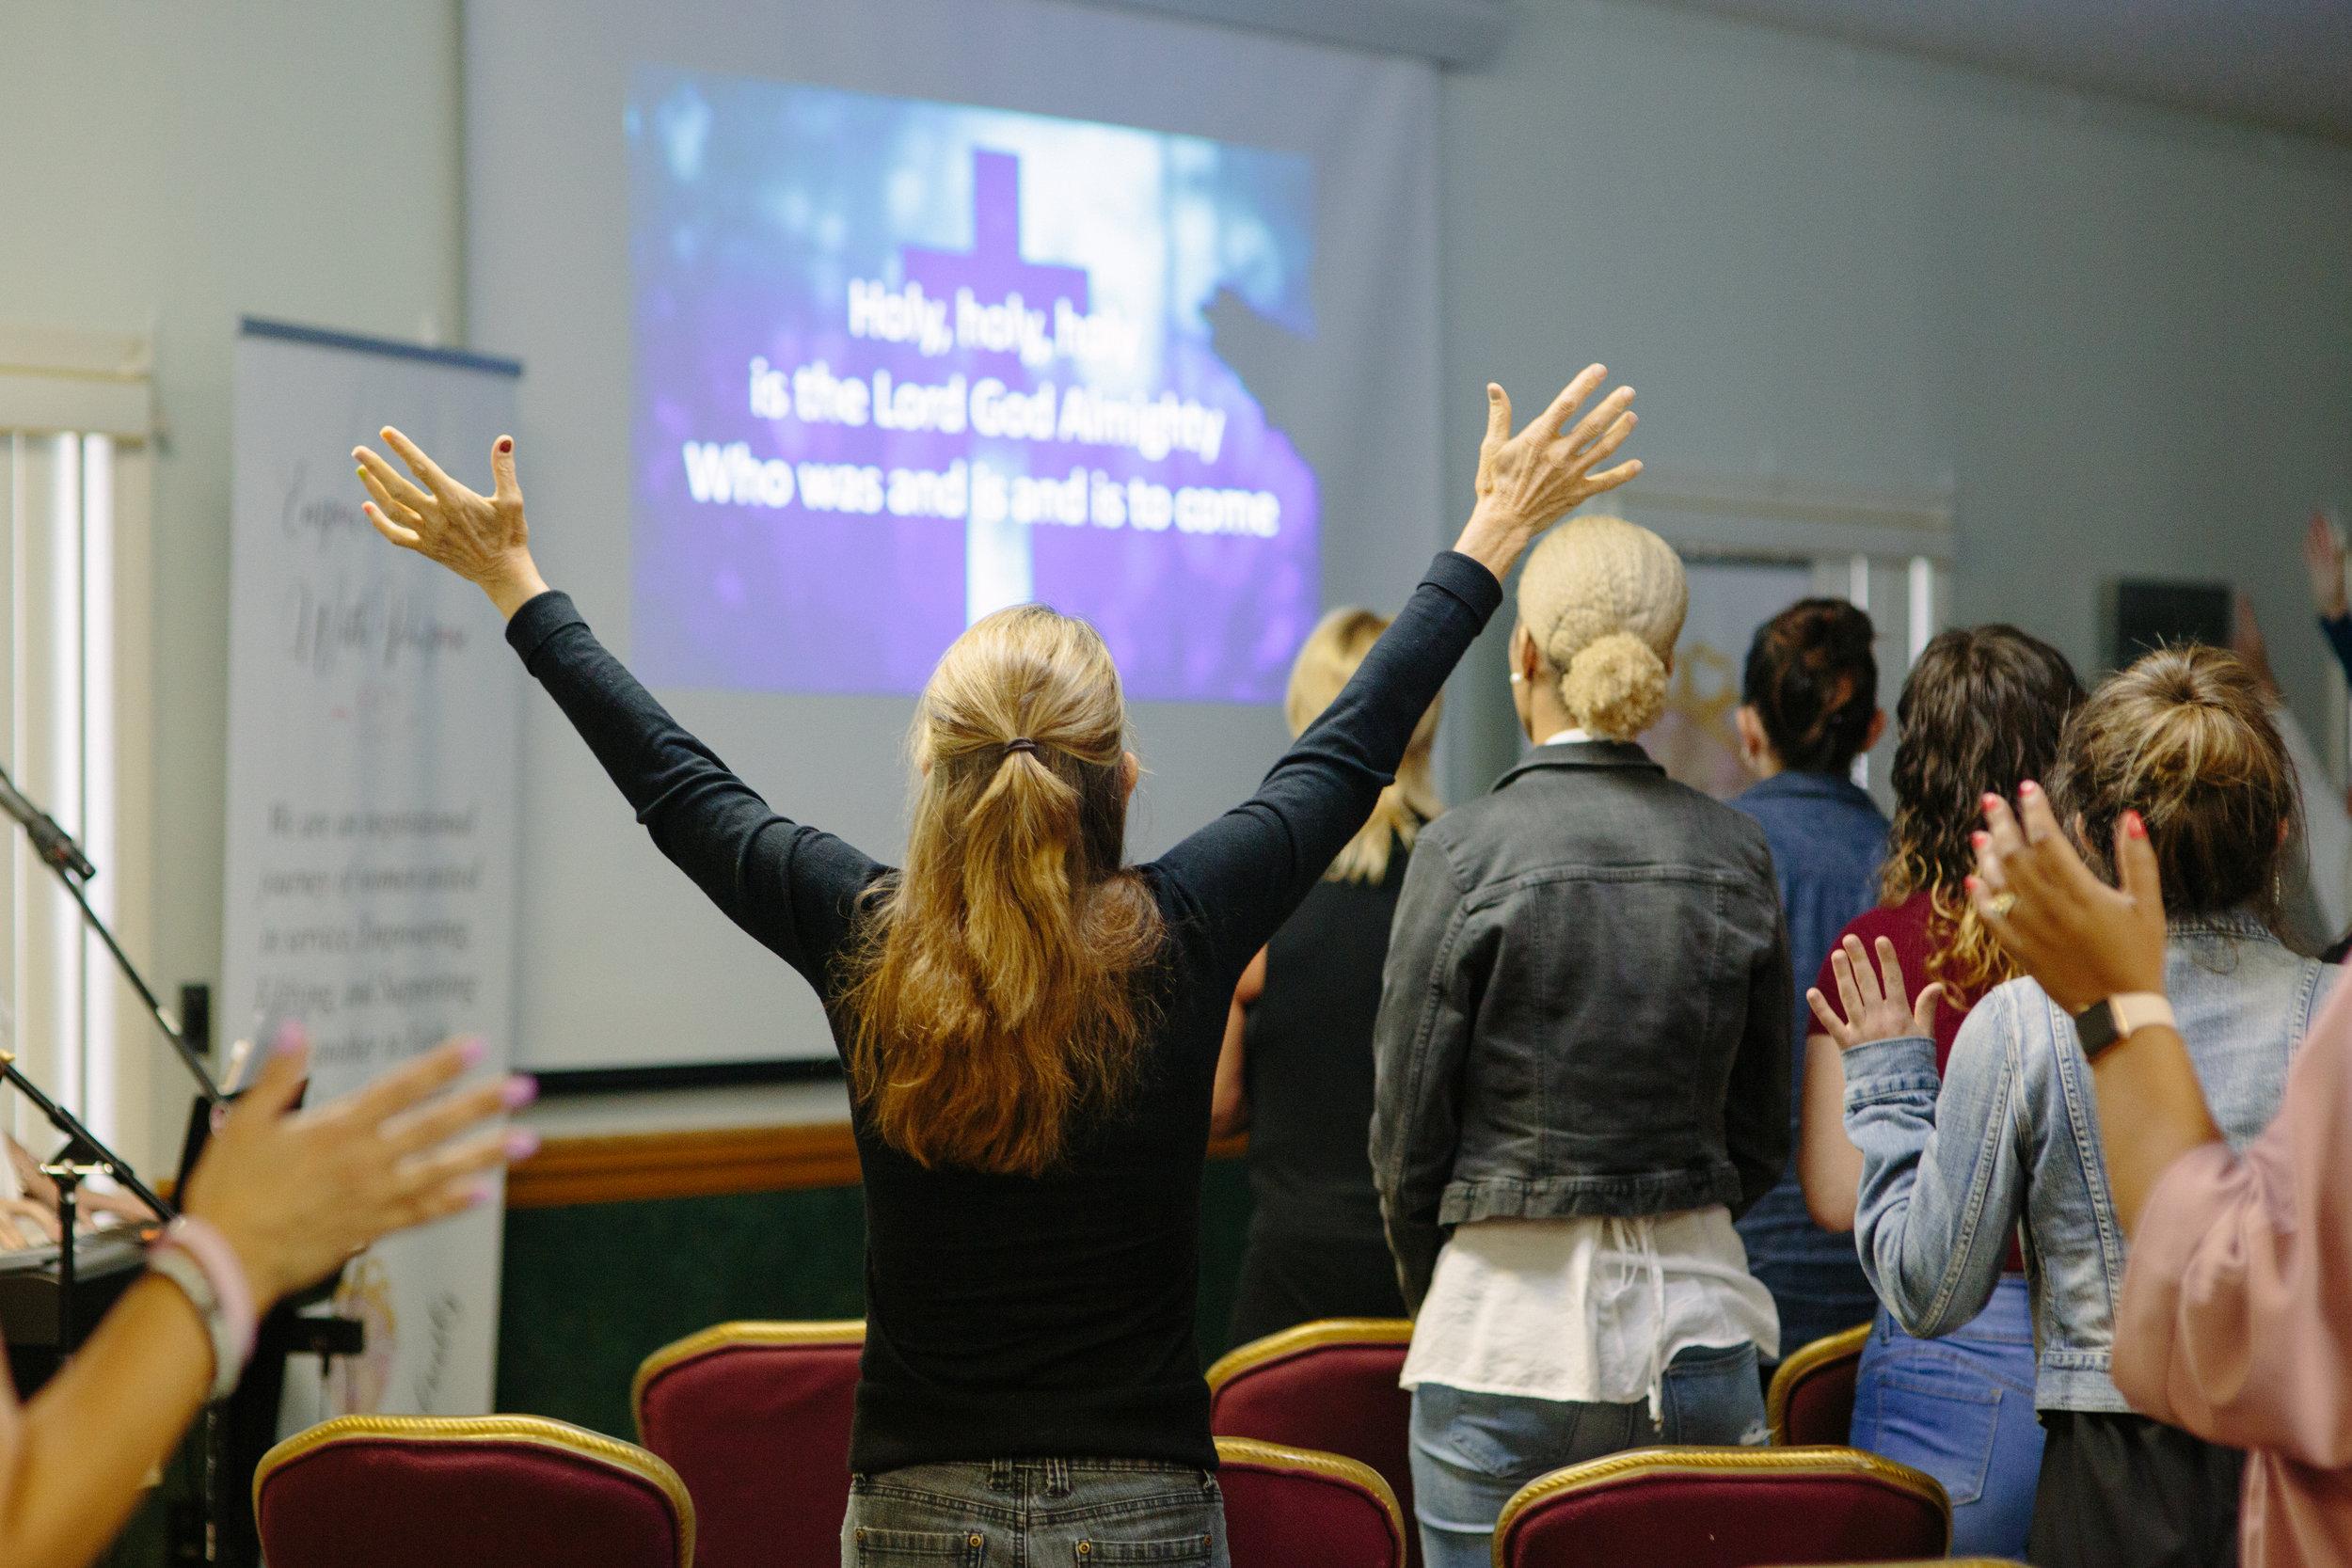 women-world-leaders-events